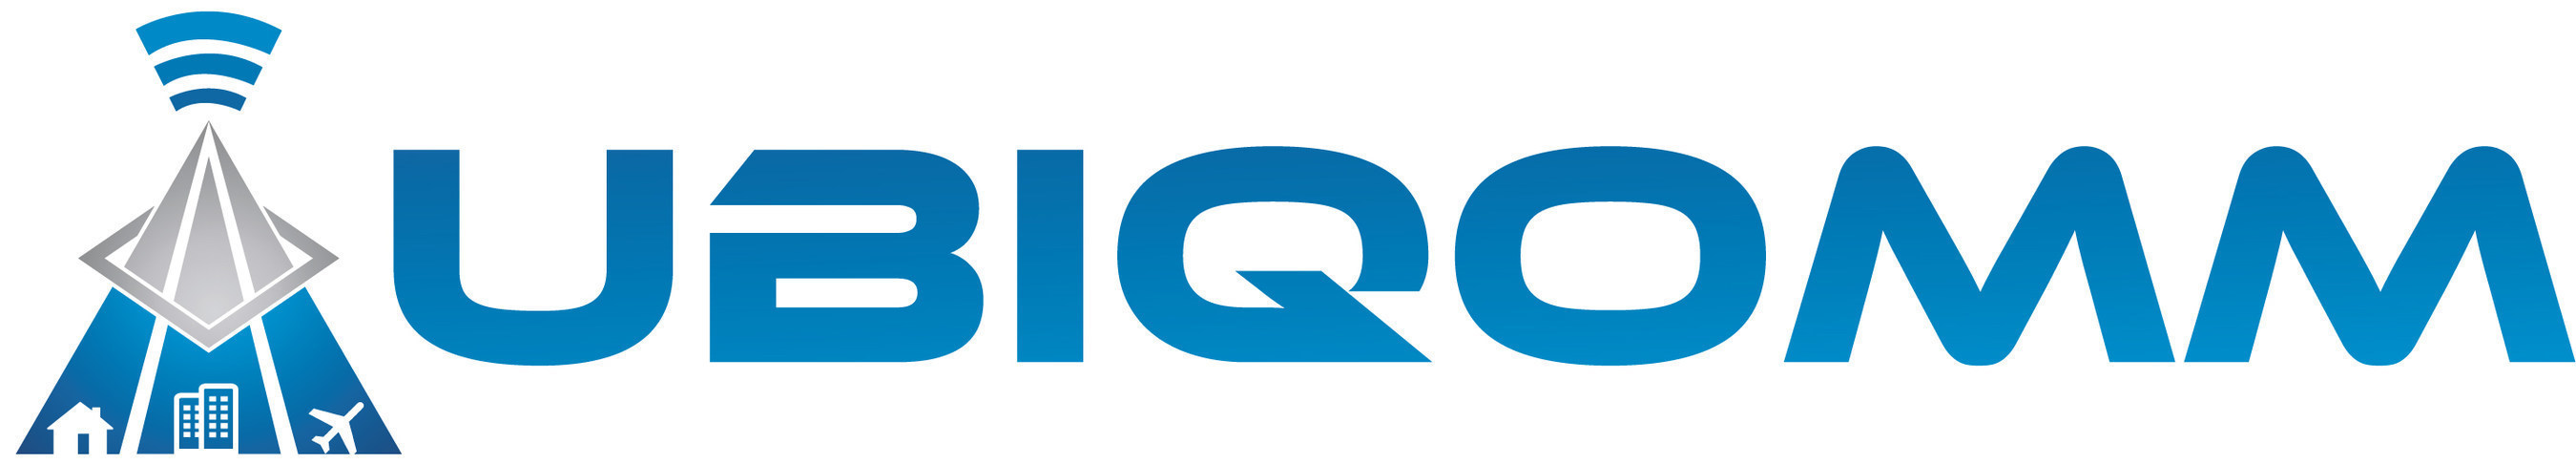 ubiqomm_logo_original_rvsd_Logo